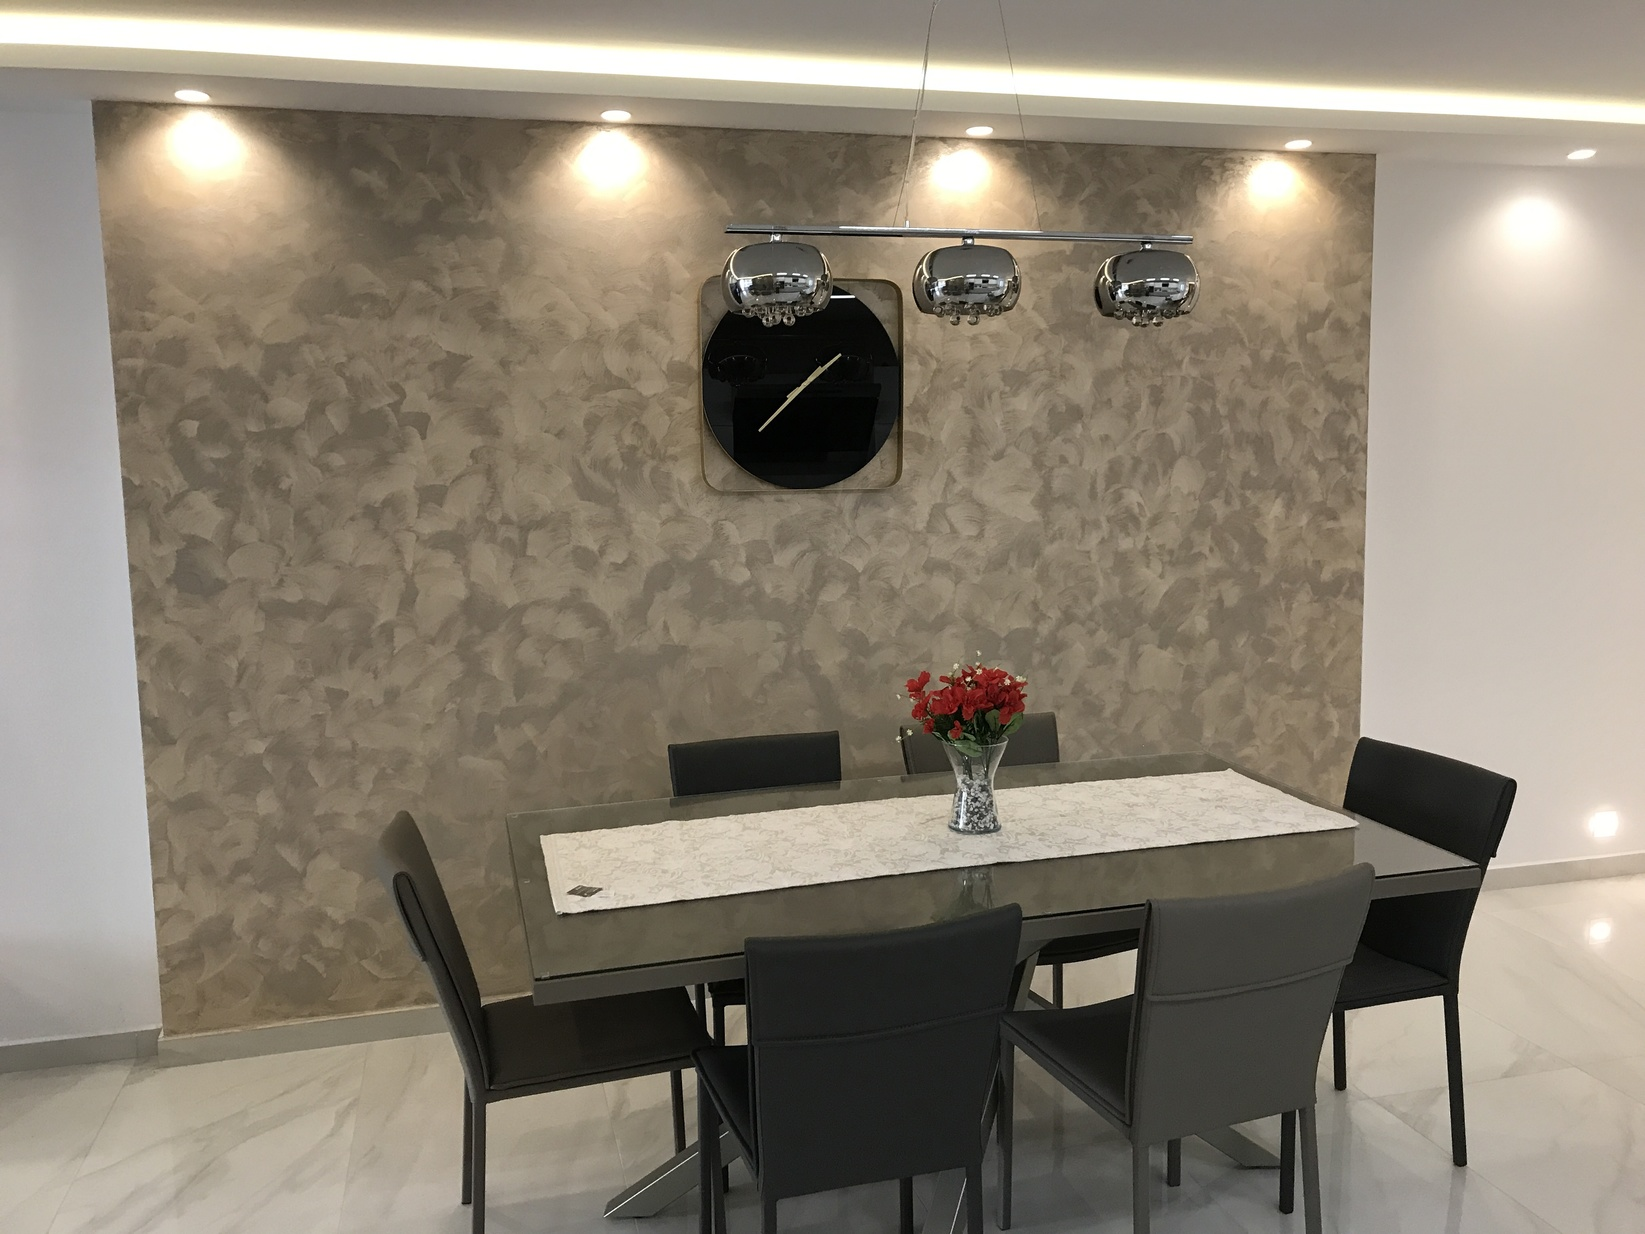 3 bed Apartment For Rent in Qawra, Qawra - thumb 12